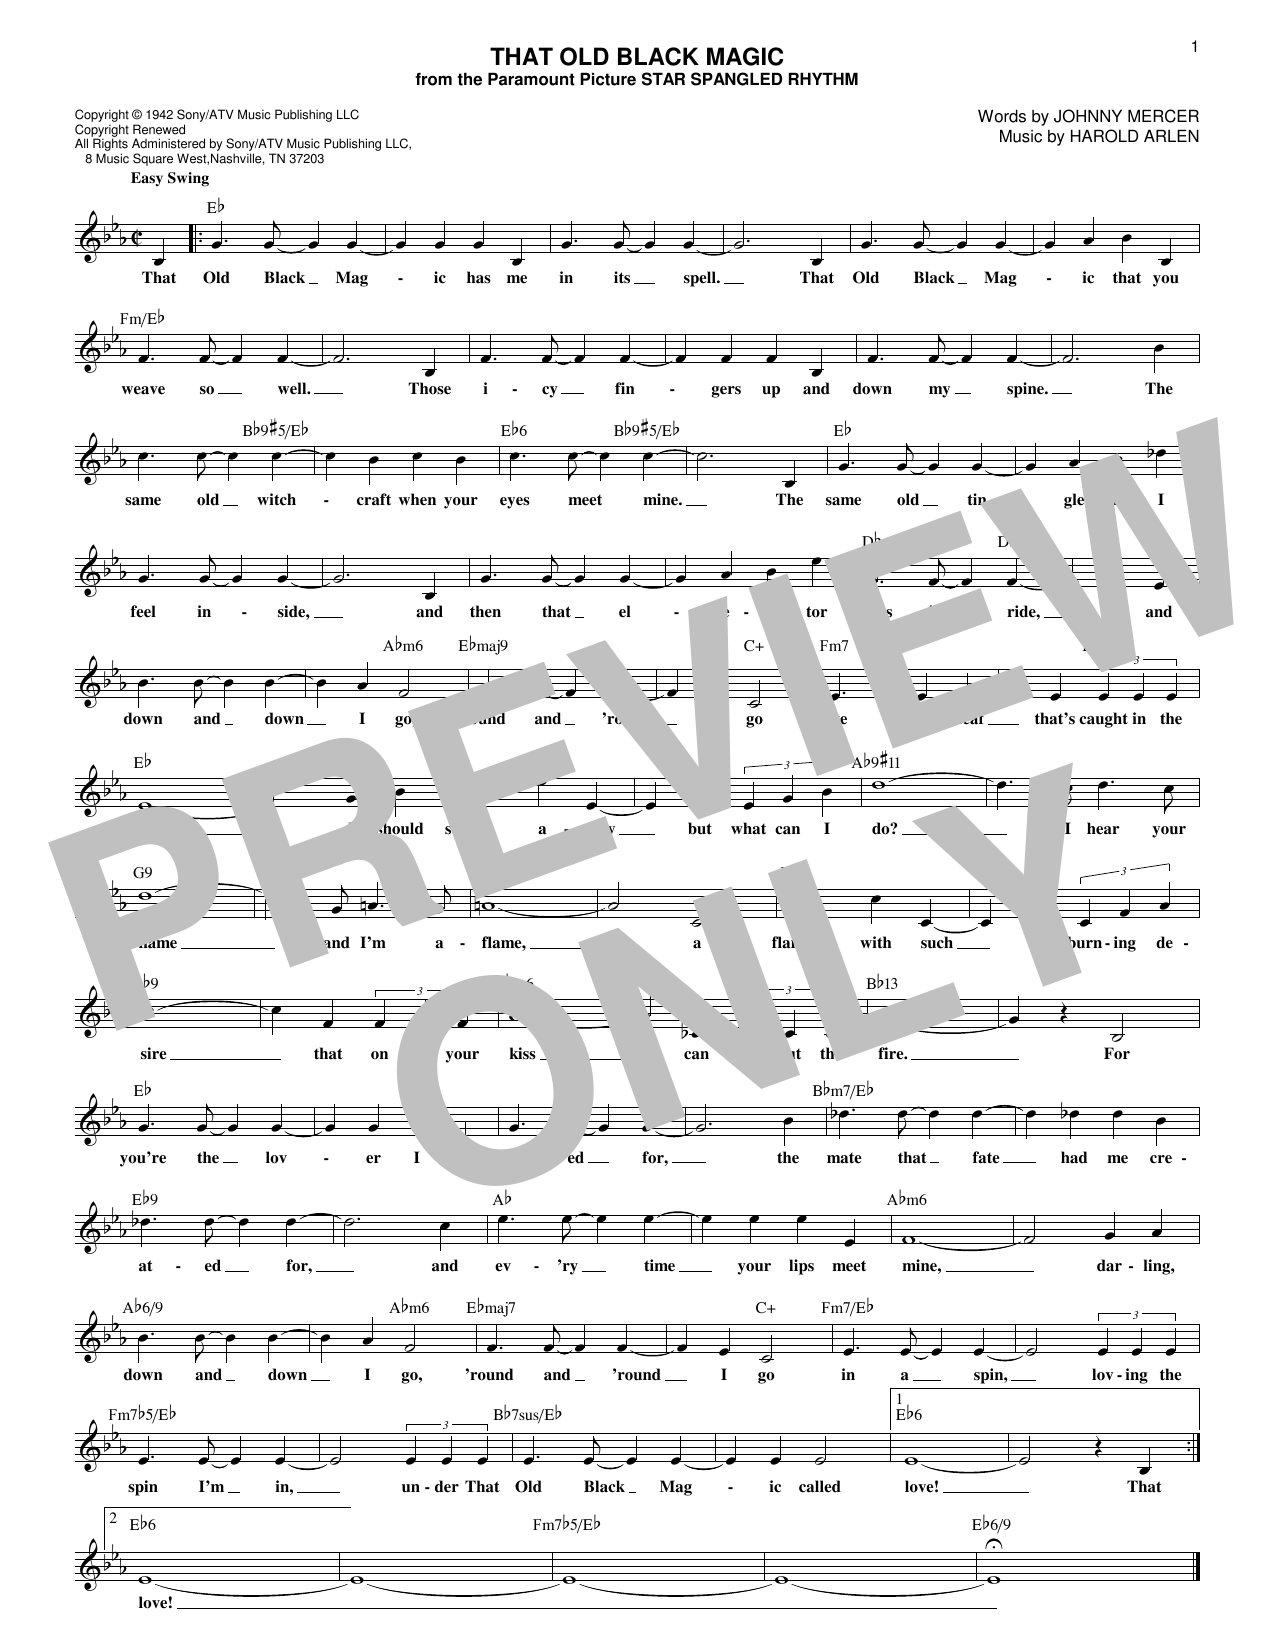 Harold Arlen and Johnny Mercer That Old Black Magic sheet music notes and chords. Download Printable PDF.